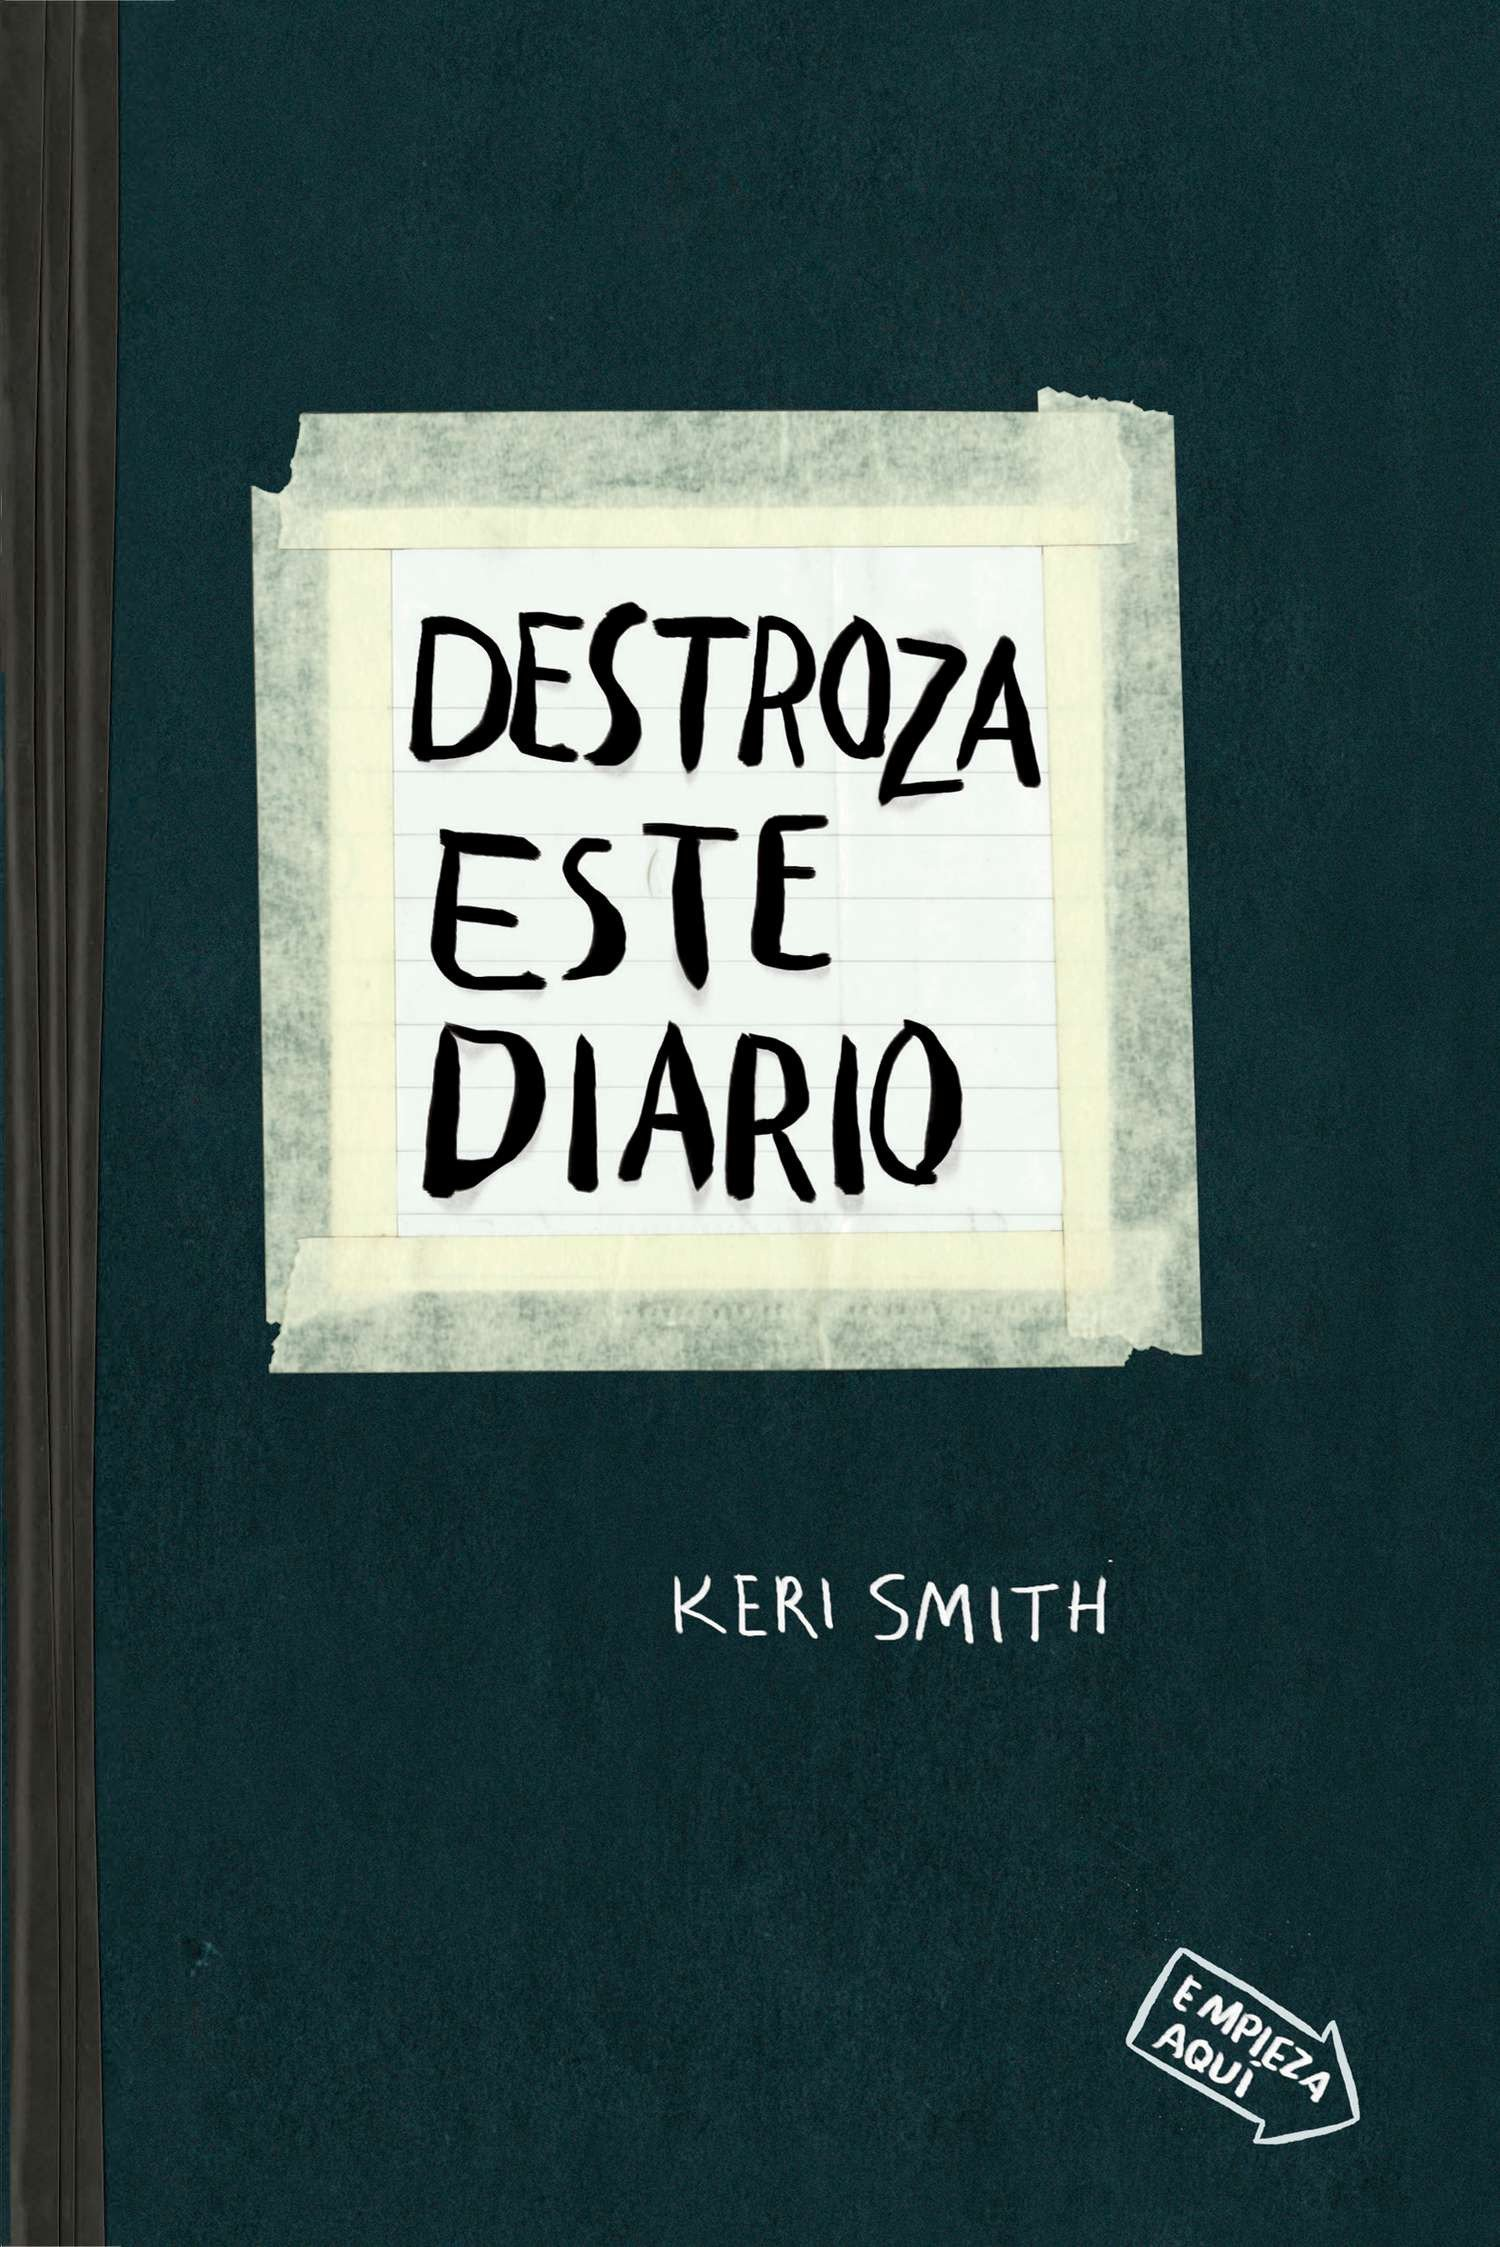 SPA-DESTROZA ESTE DIARIO: Amazon.es: Smith, Keri: Libros